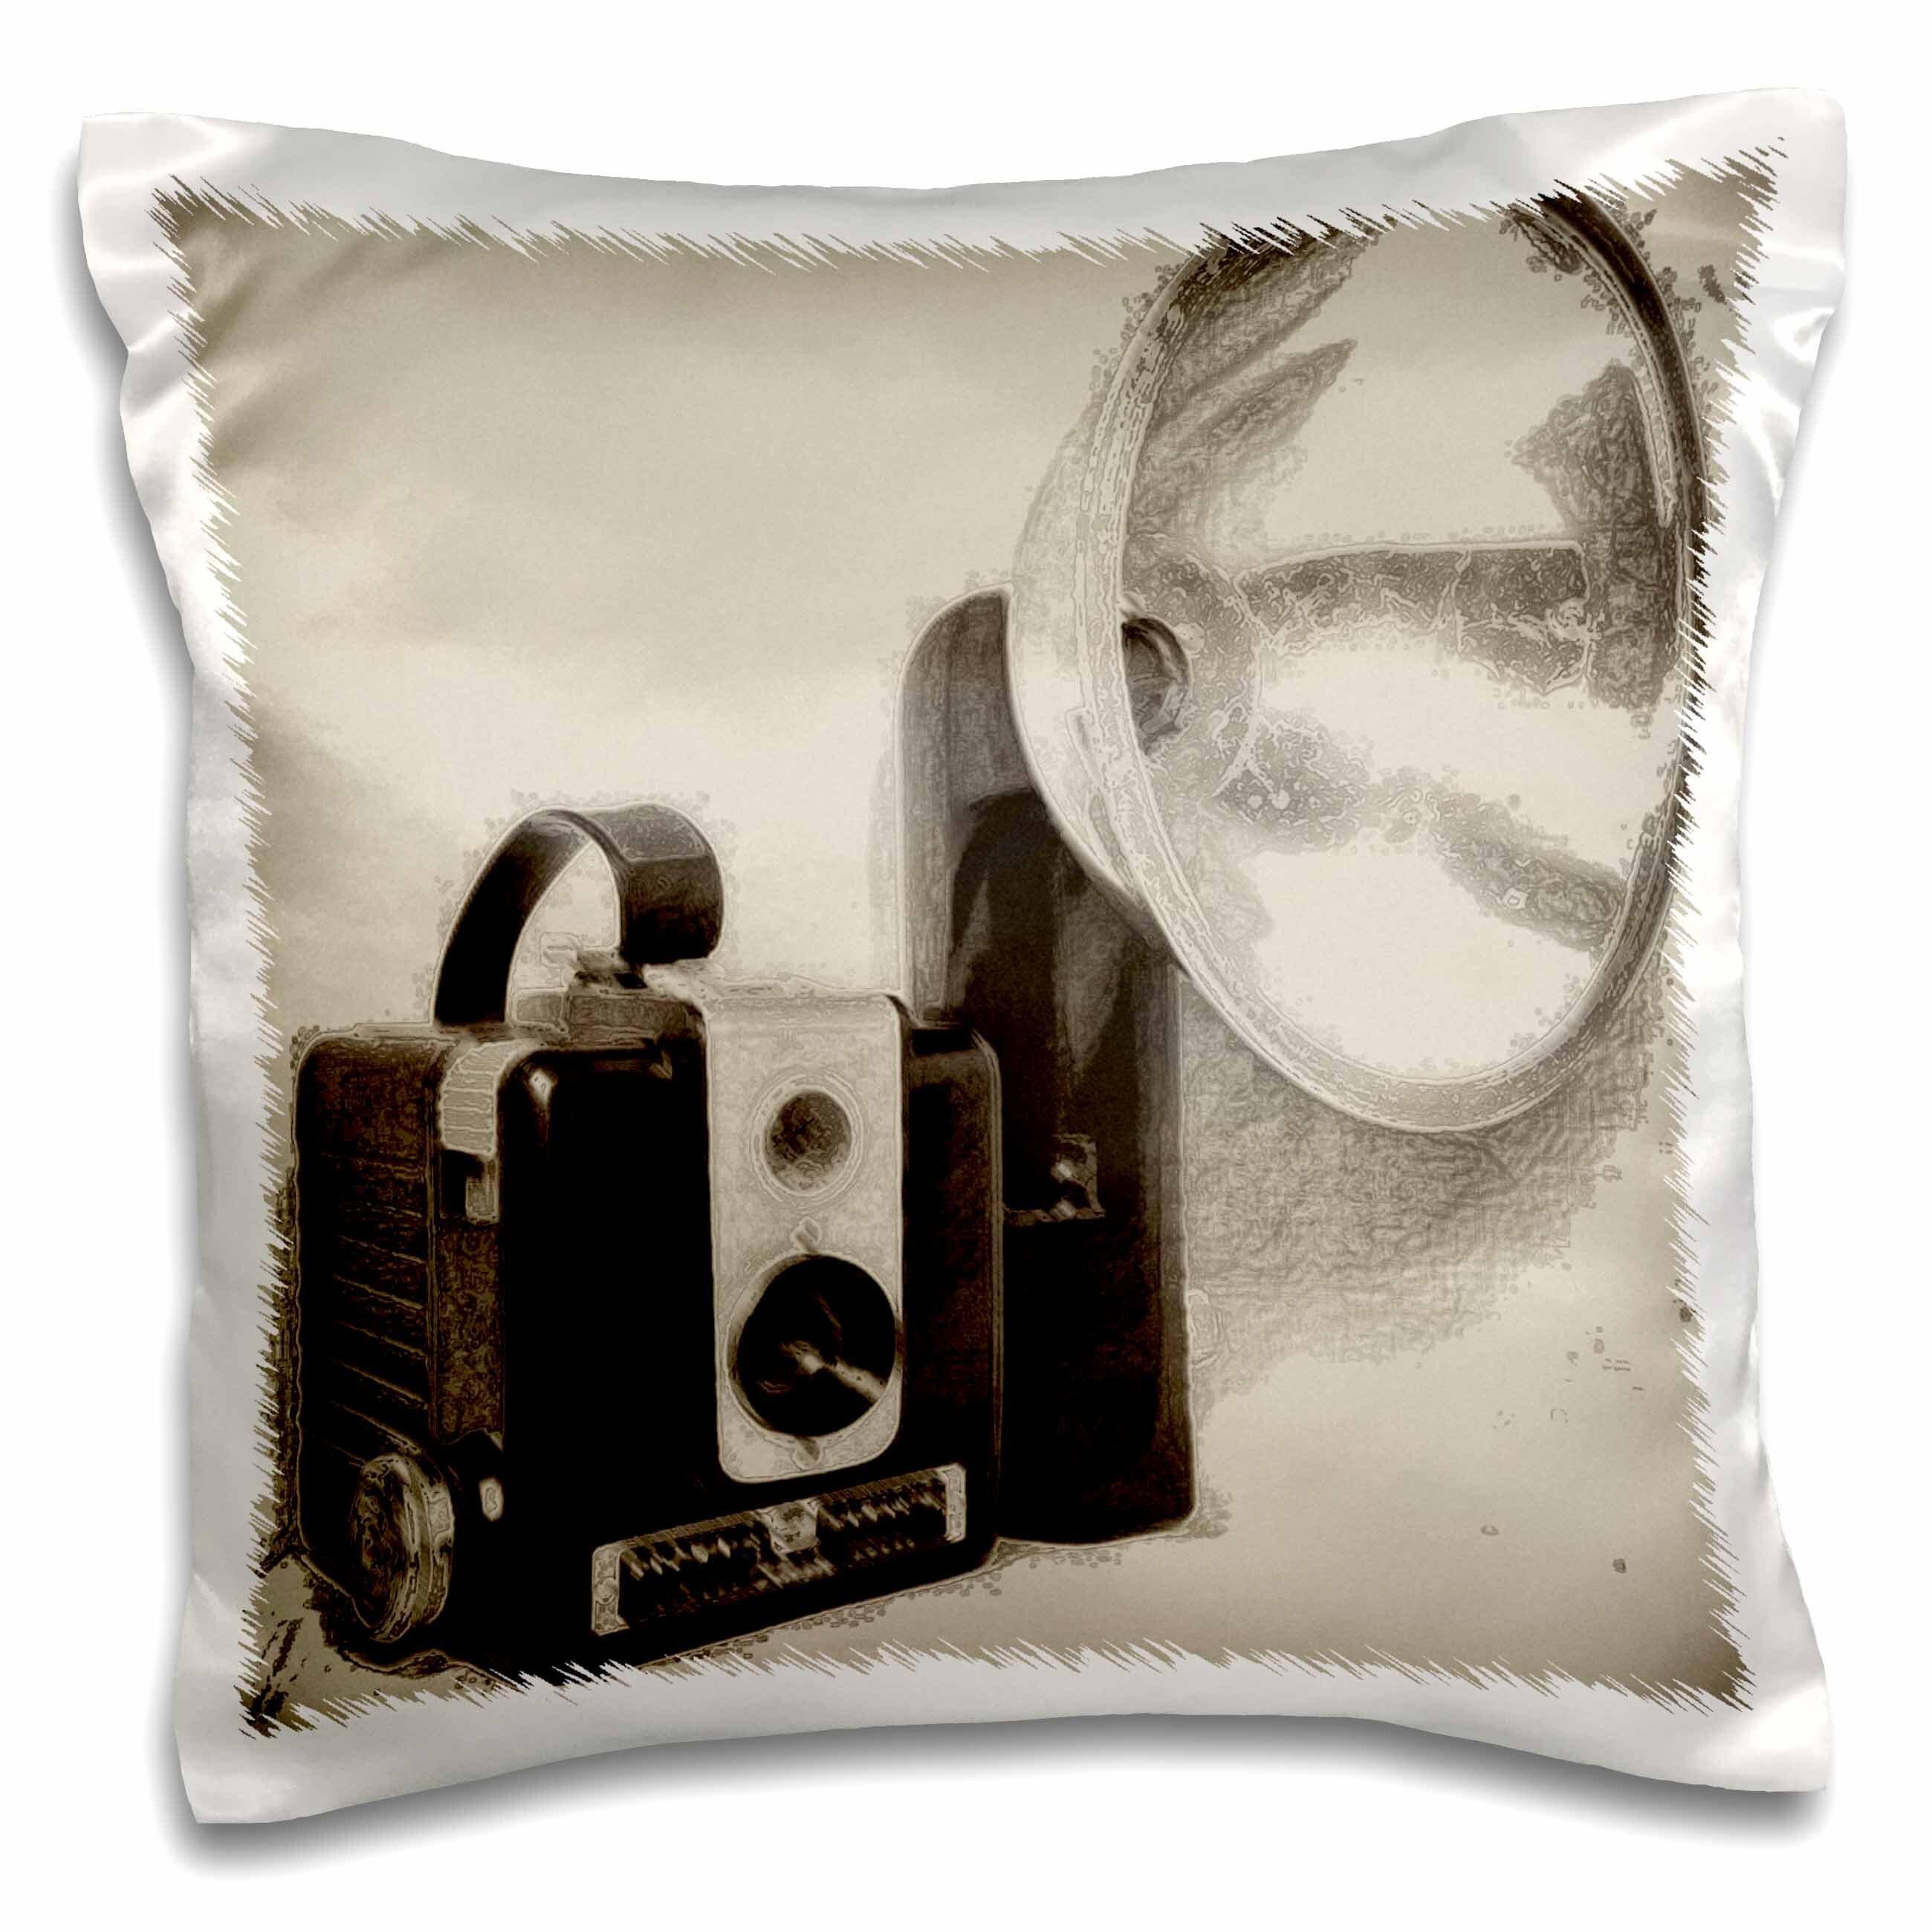 East Urban Home Vintage 1950s Camera Throw Pillow Cover Wayfair